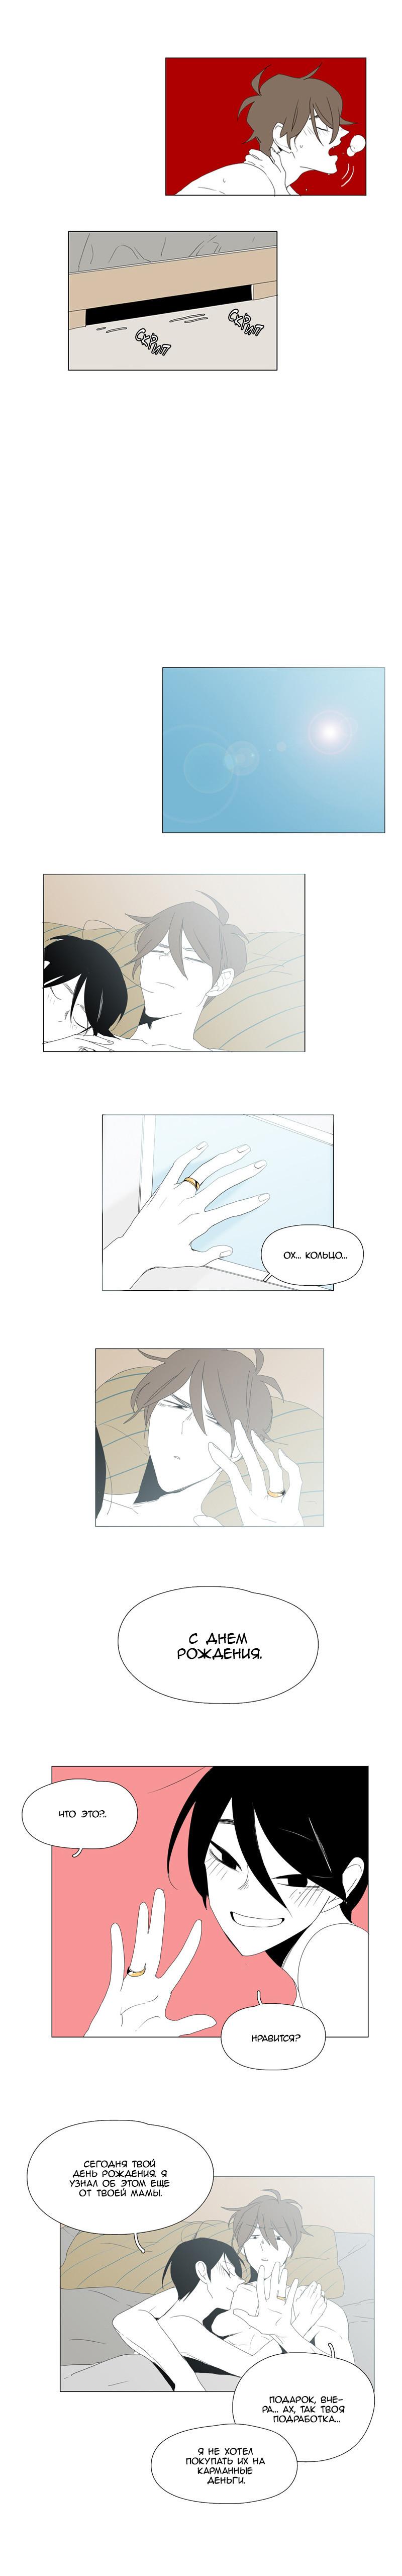 https://r1.ninemanga.com/comics/pic2/33/27873/333362/1504714631936.jpg Page 11